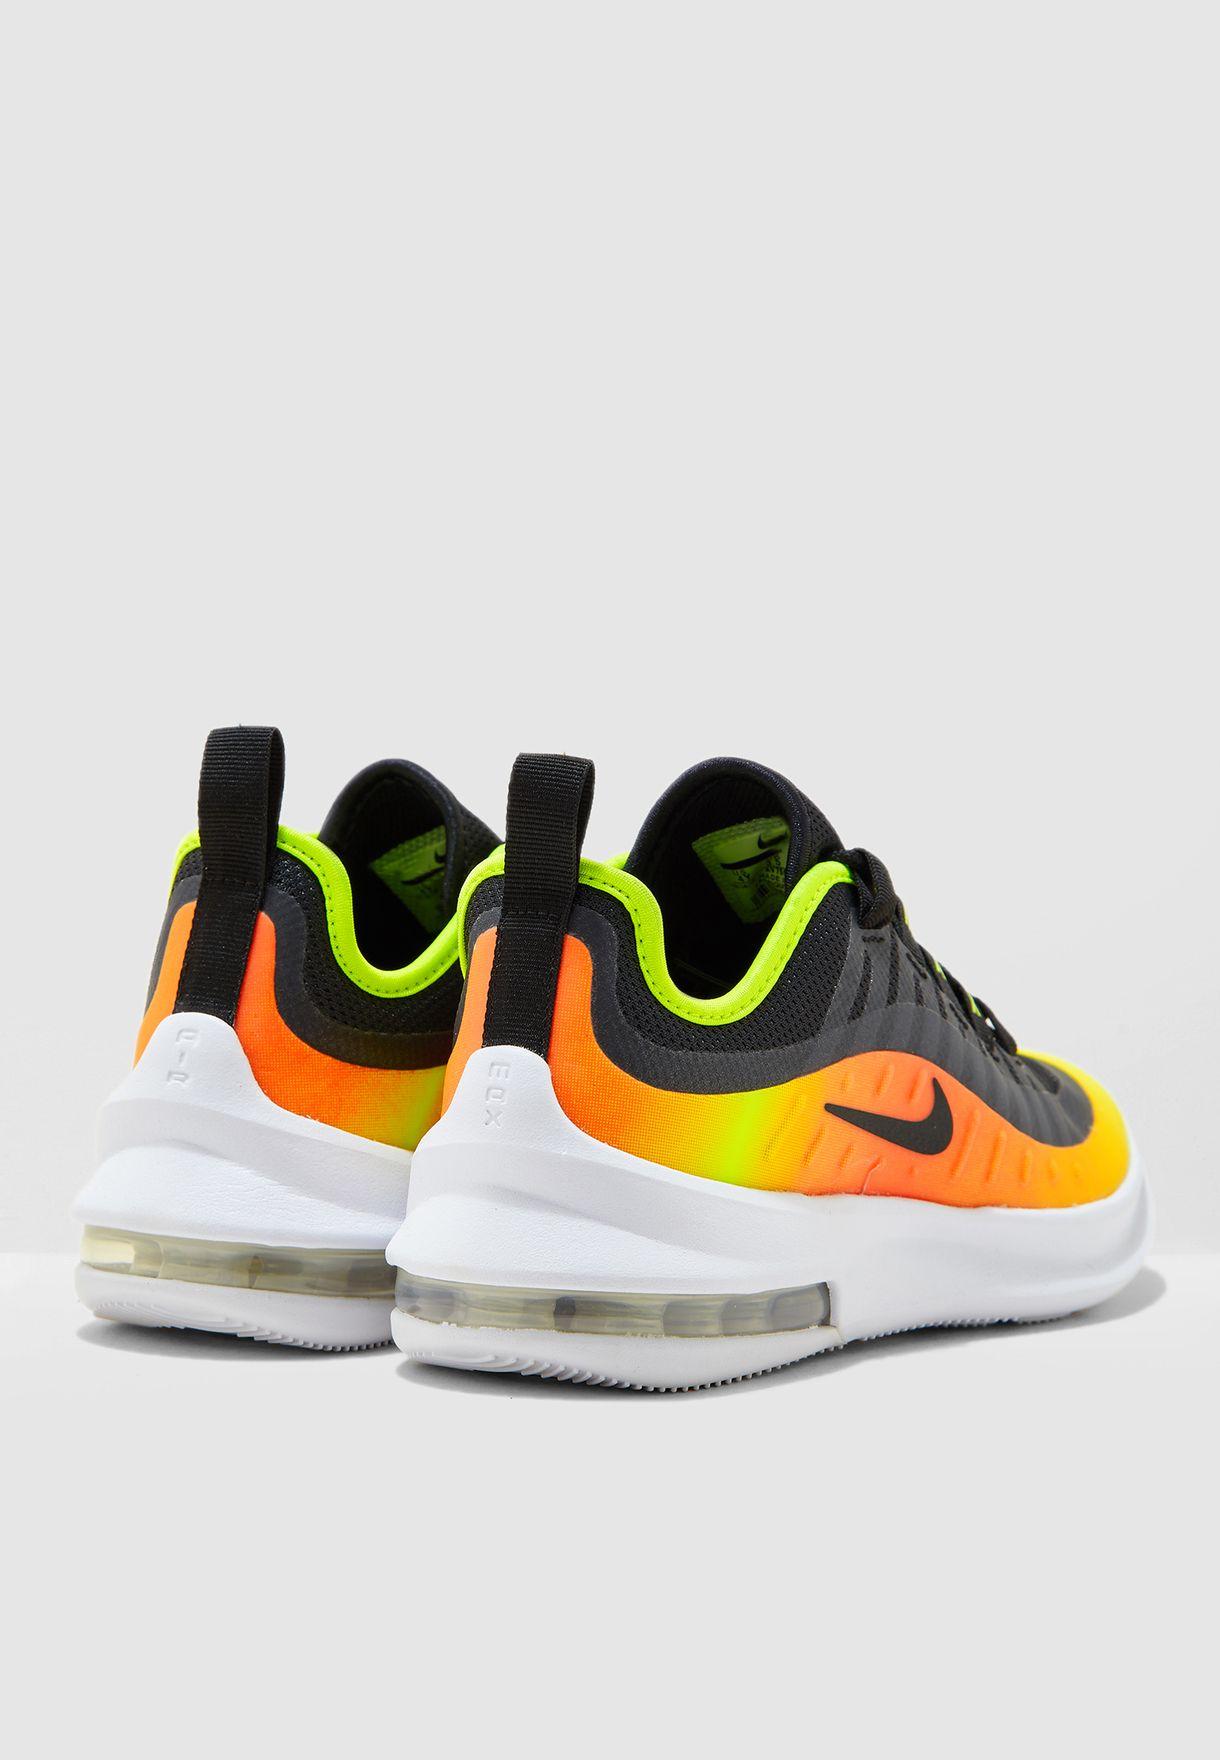 Nike Air Max Axis AV7590